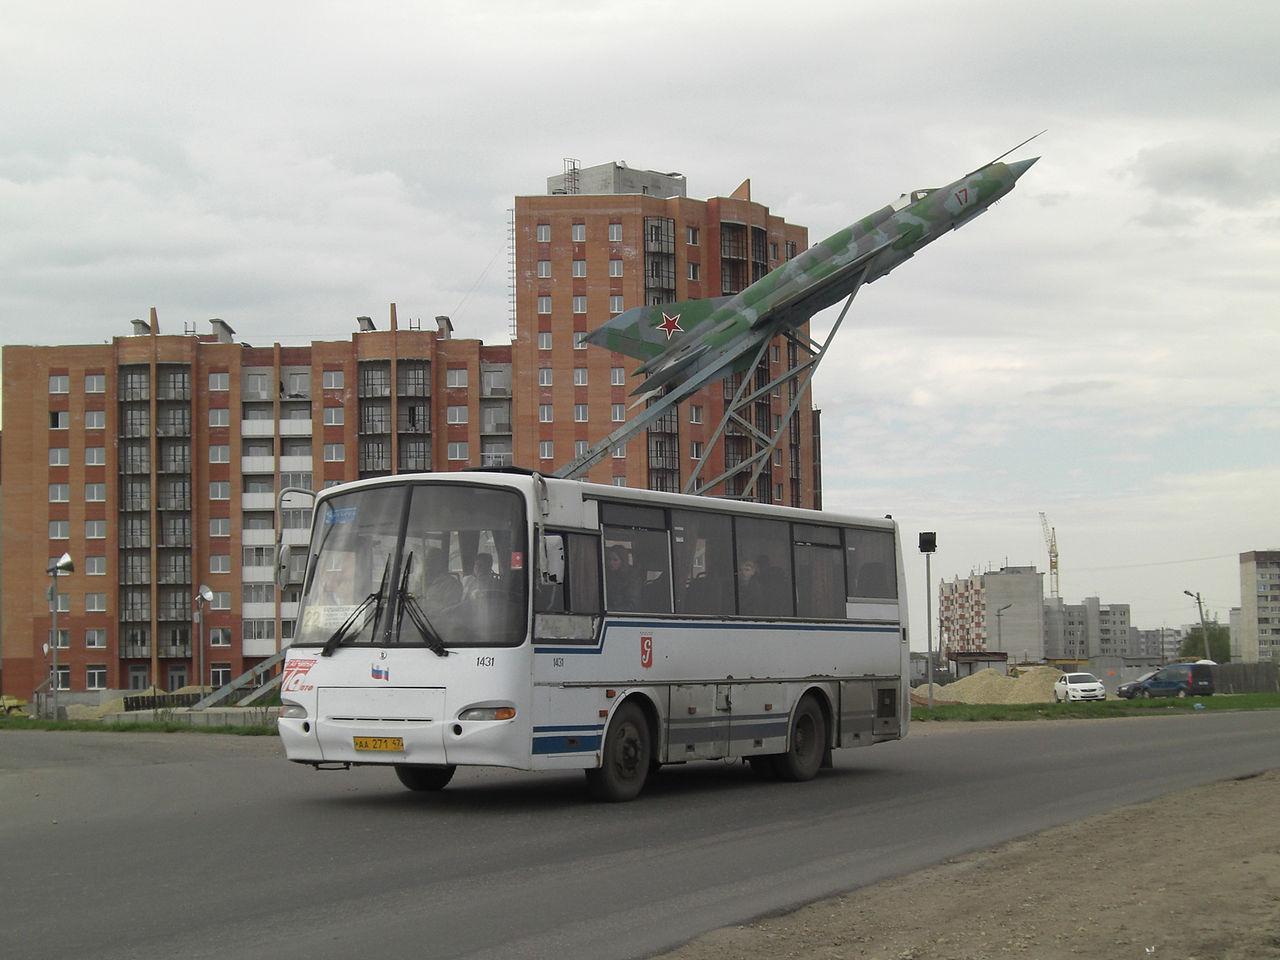 Гатчина. Автор фото: User:Serko (Wikimedia Commons)